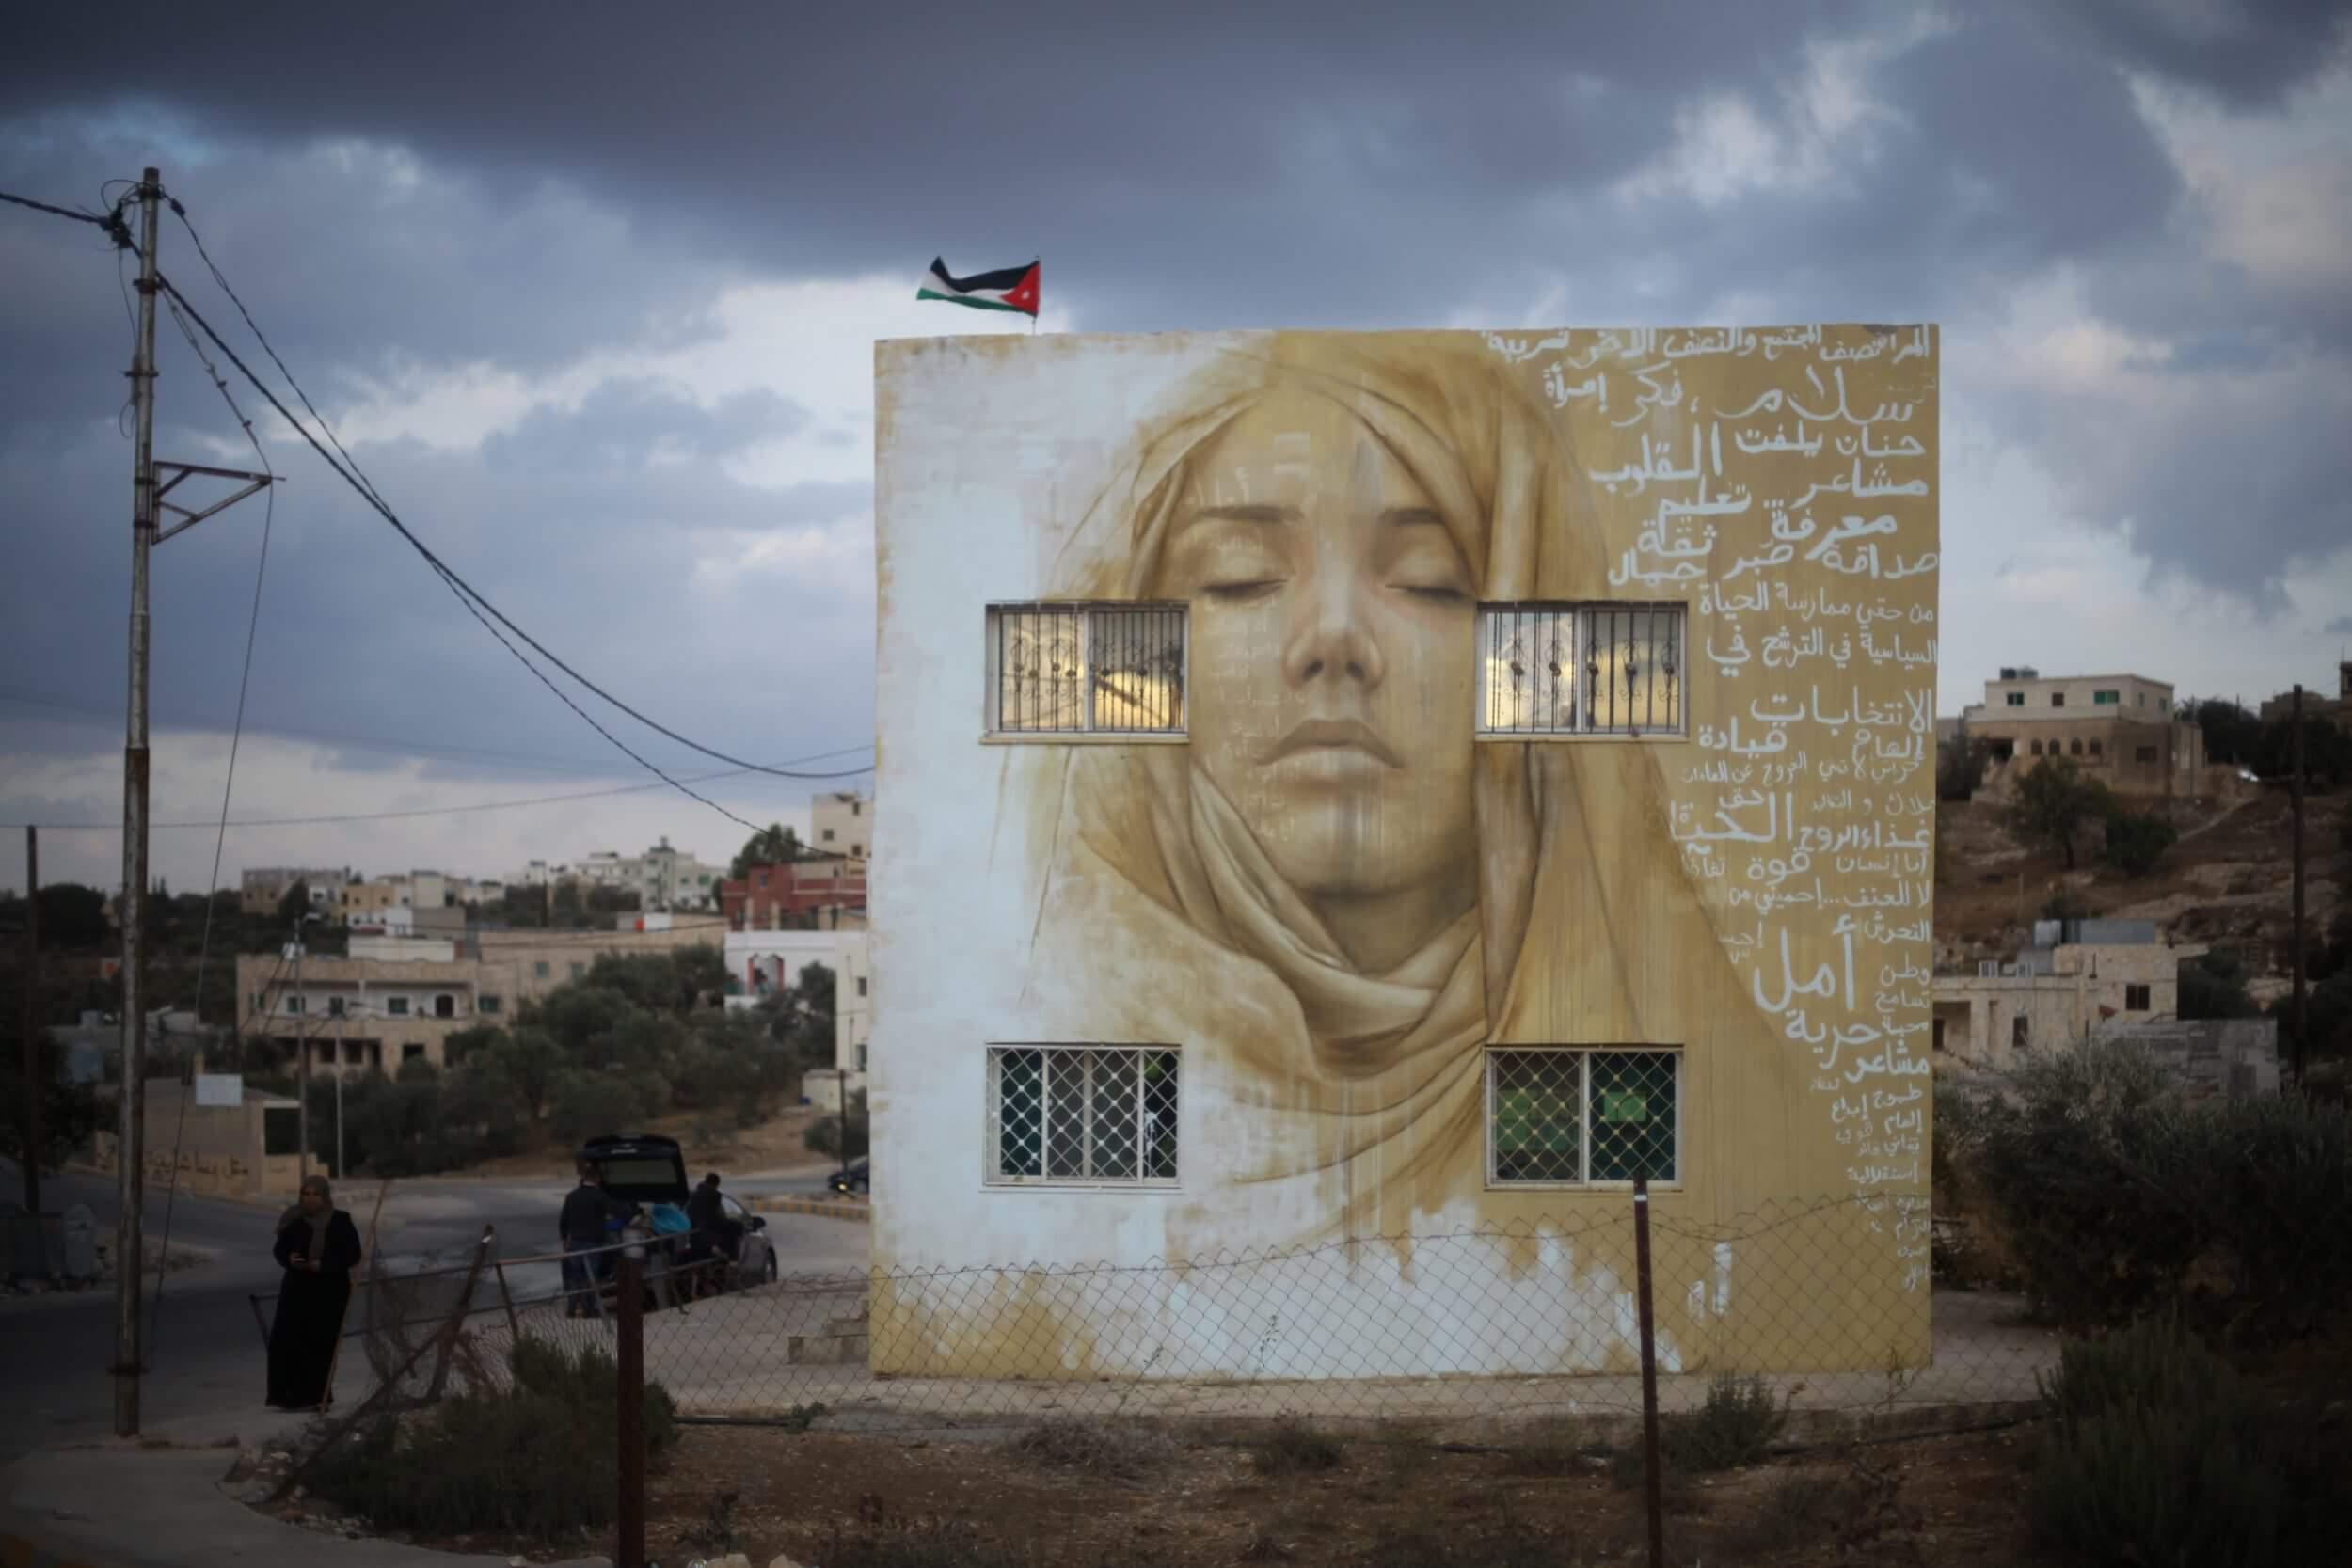 Jonathan Darby's Street Art Murals Inspire Jordan's Women, 2016